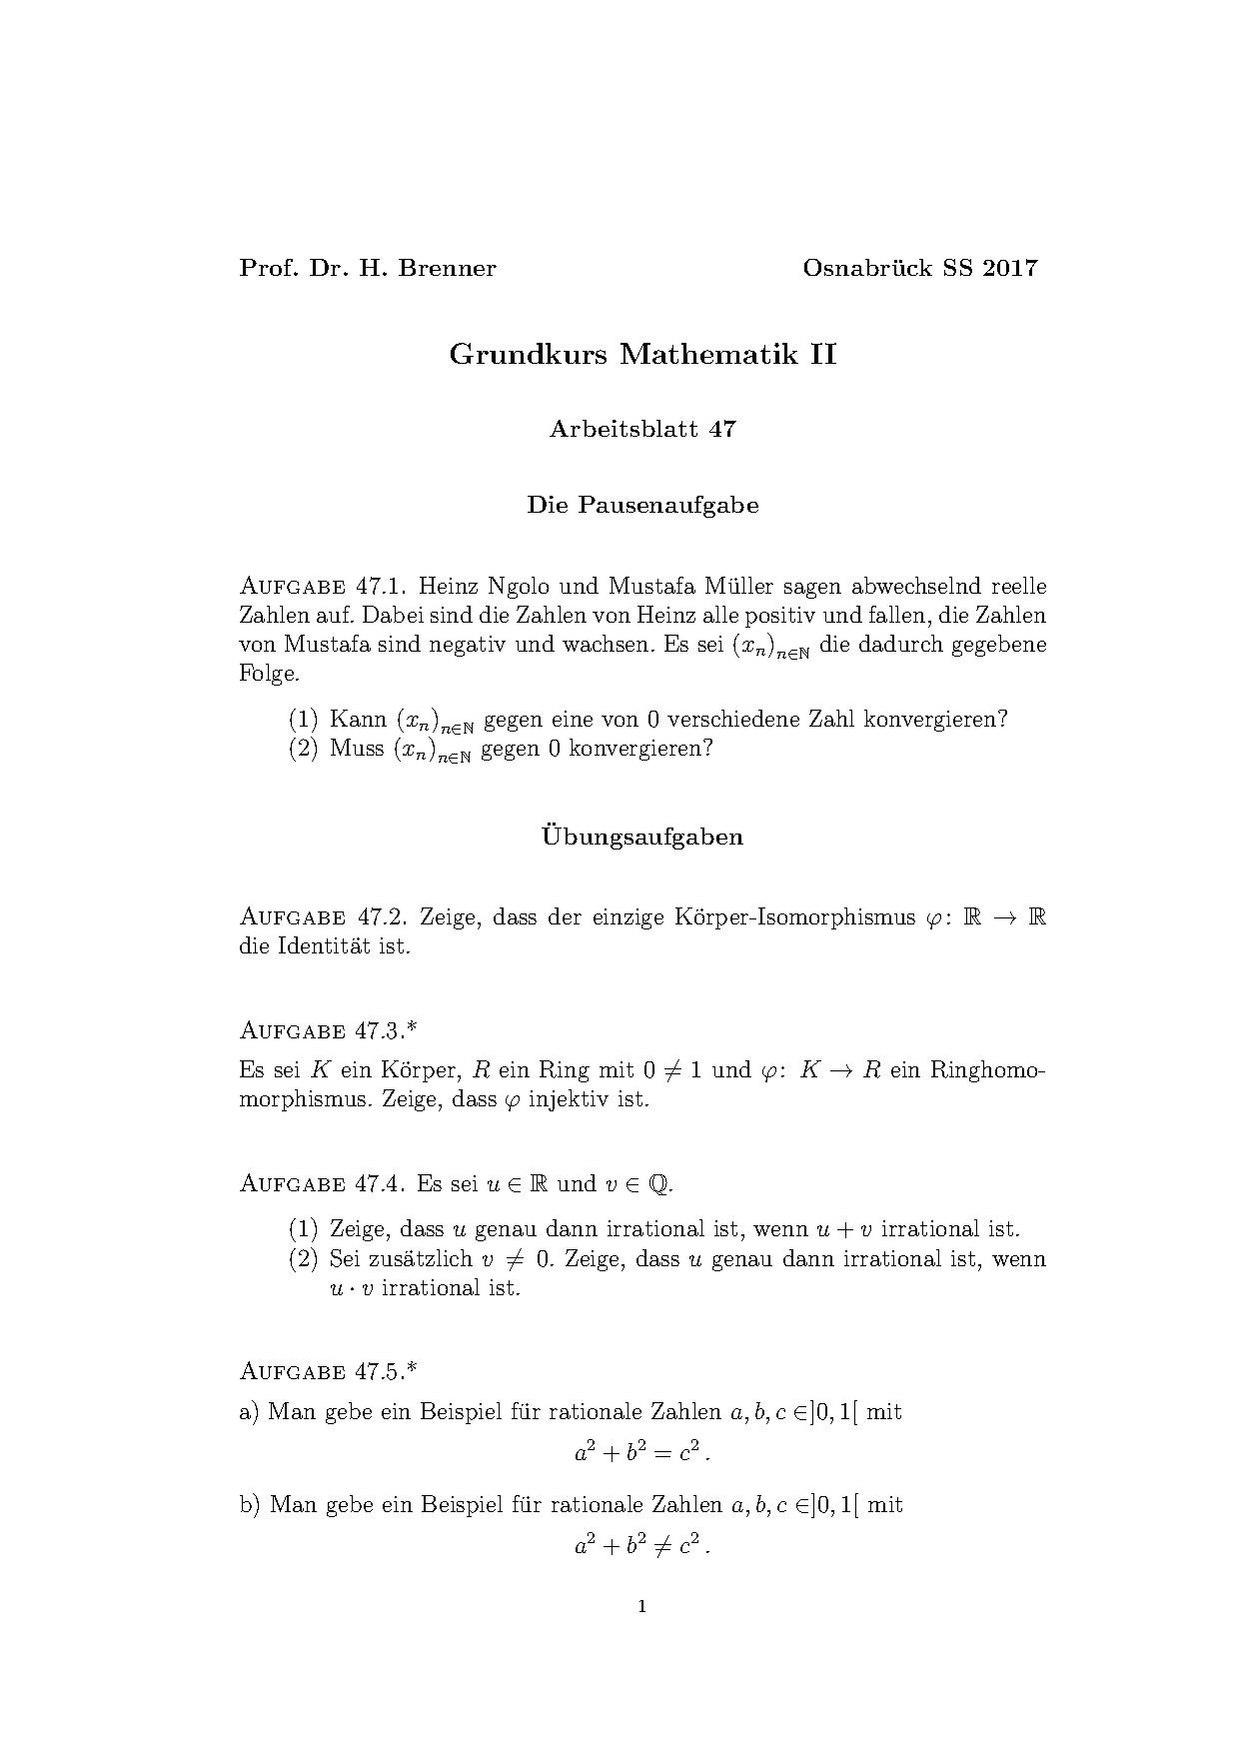 File:Grundkurs Mathematik (Osnabrück 2016-2017)Teil IIArbeitsblatt47 ...